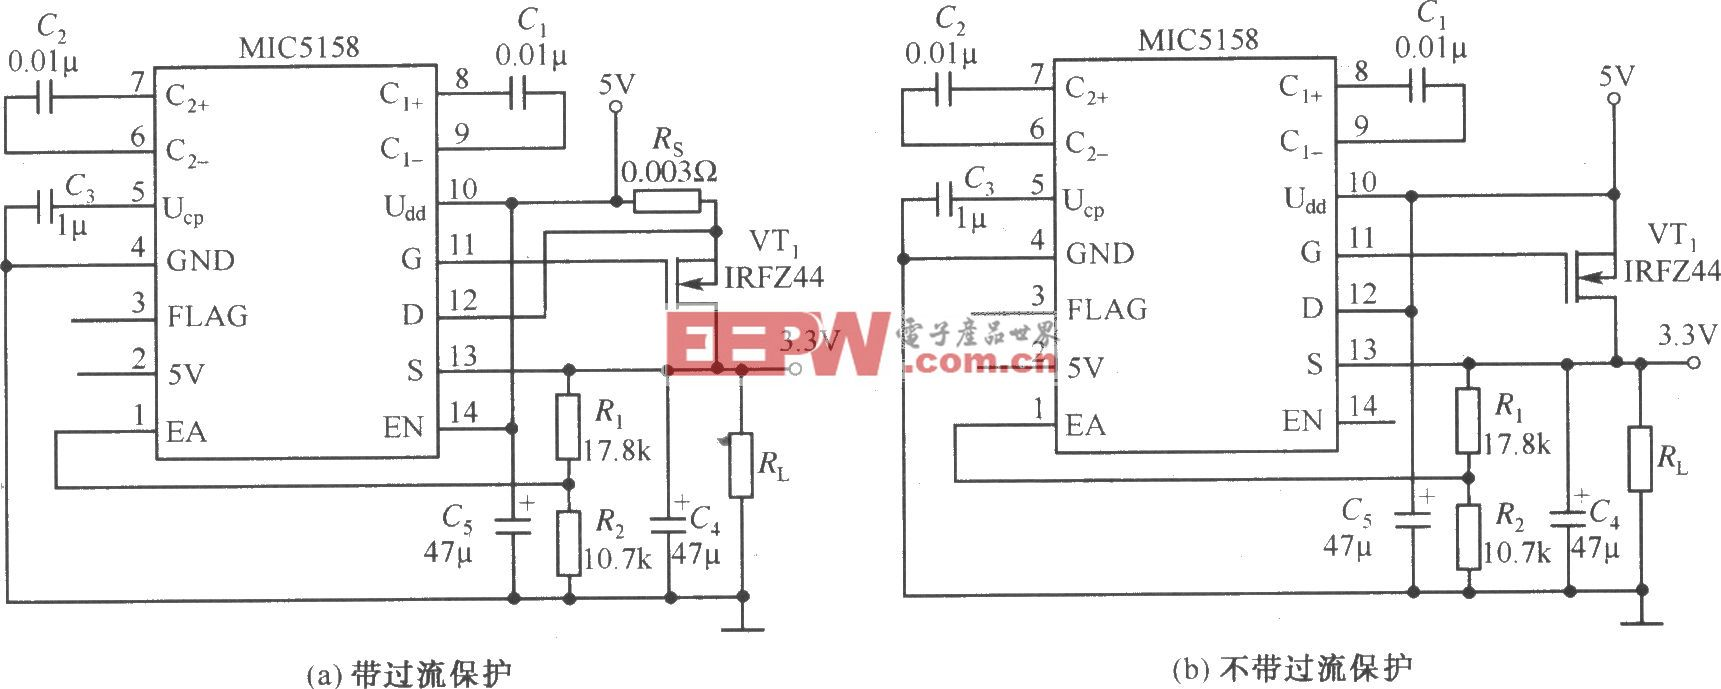 MIC5158构成的外围电路简单的5V输入、3.3V/10A输出的线性稳压器电路